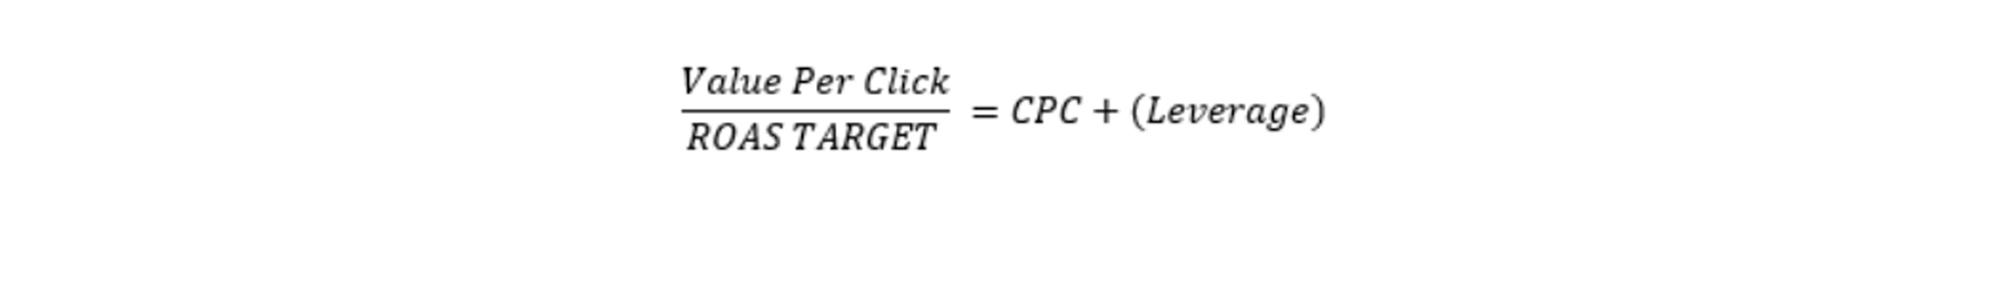 value per click roas target google shoppping